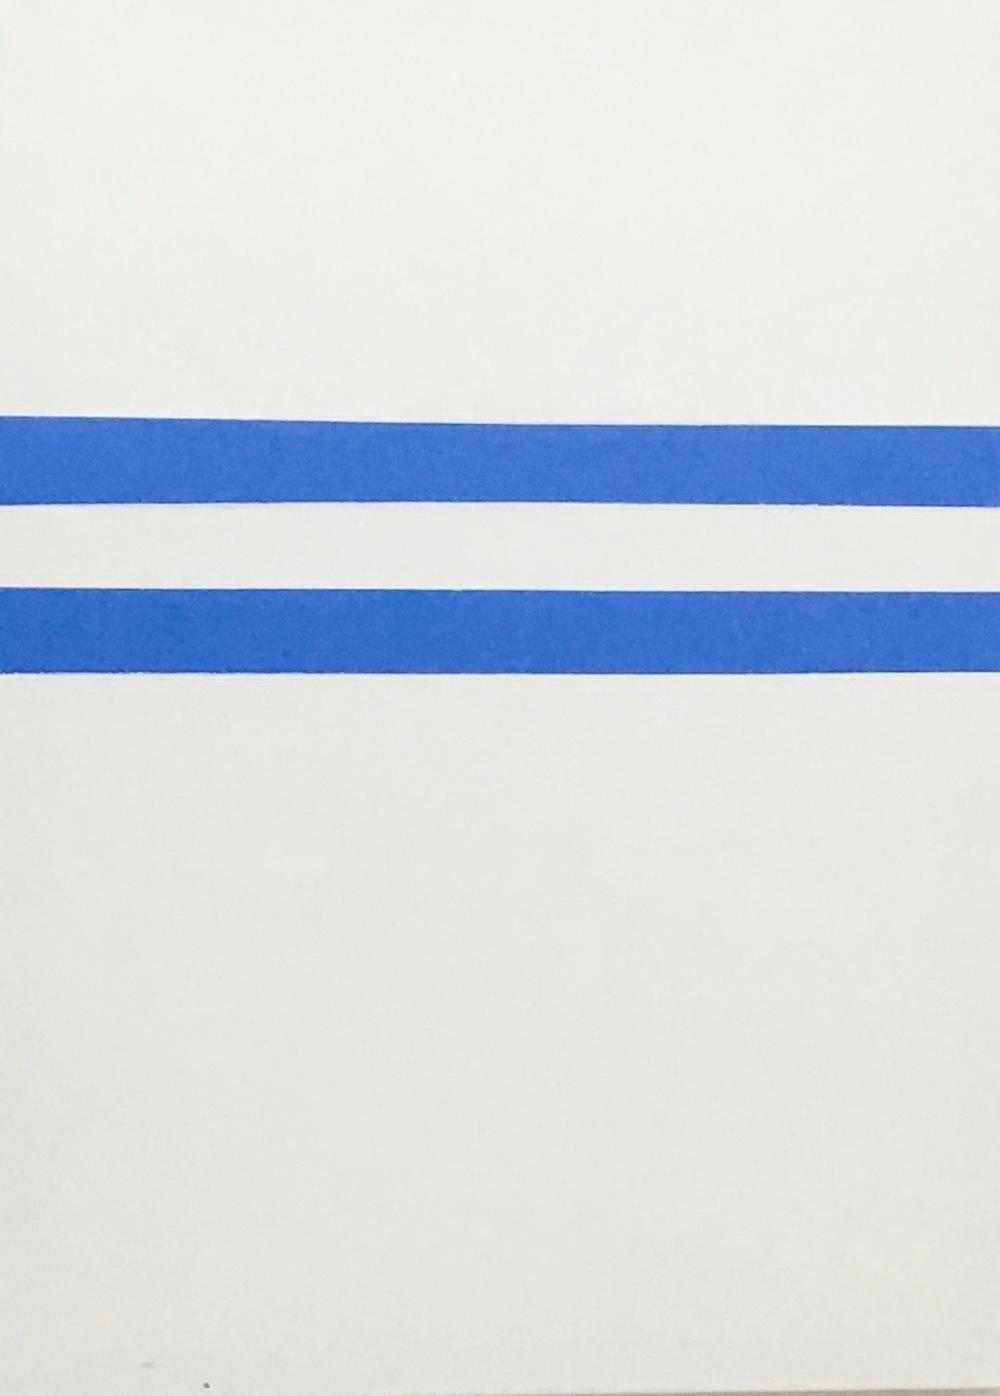 Beata Daly - Tranqulitas Terrae, oils and acrylics, 2017